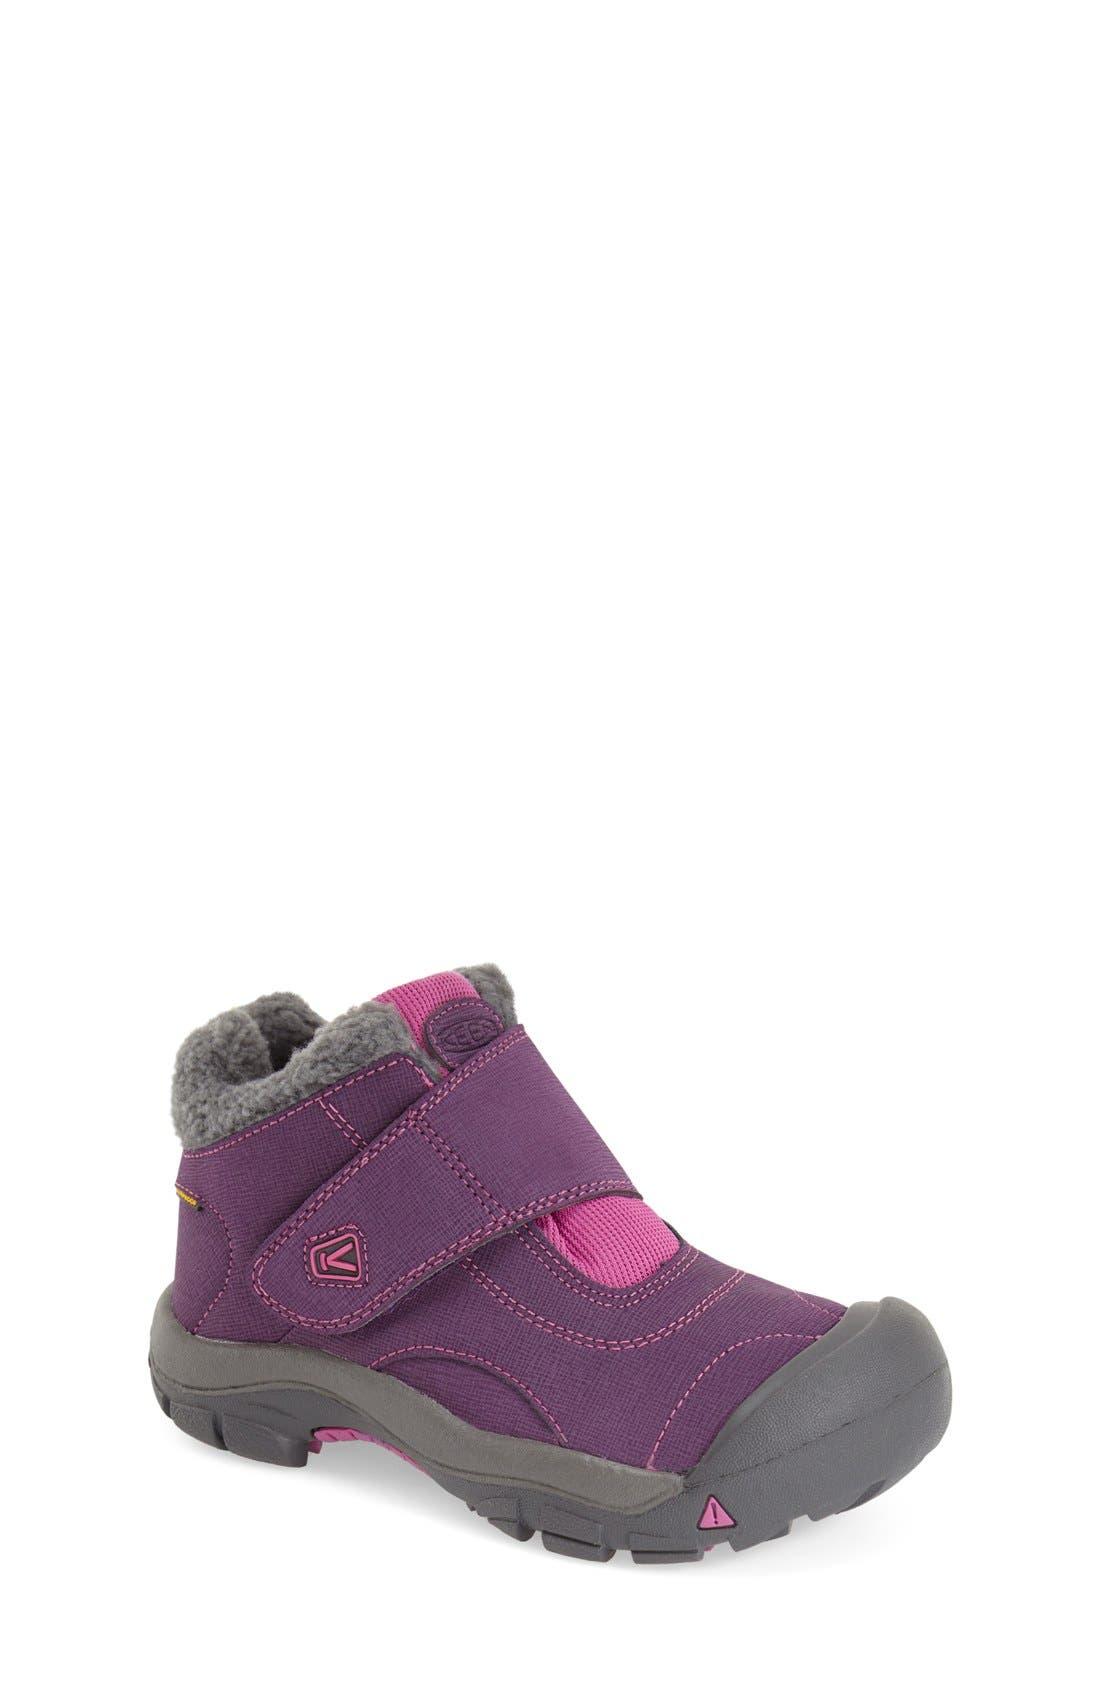 'Kootenay' Waterproof Winter Boot,                             Main thumbnail 1, color,                             Wineberry/ Dahlia Mauve